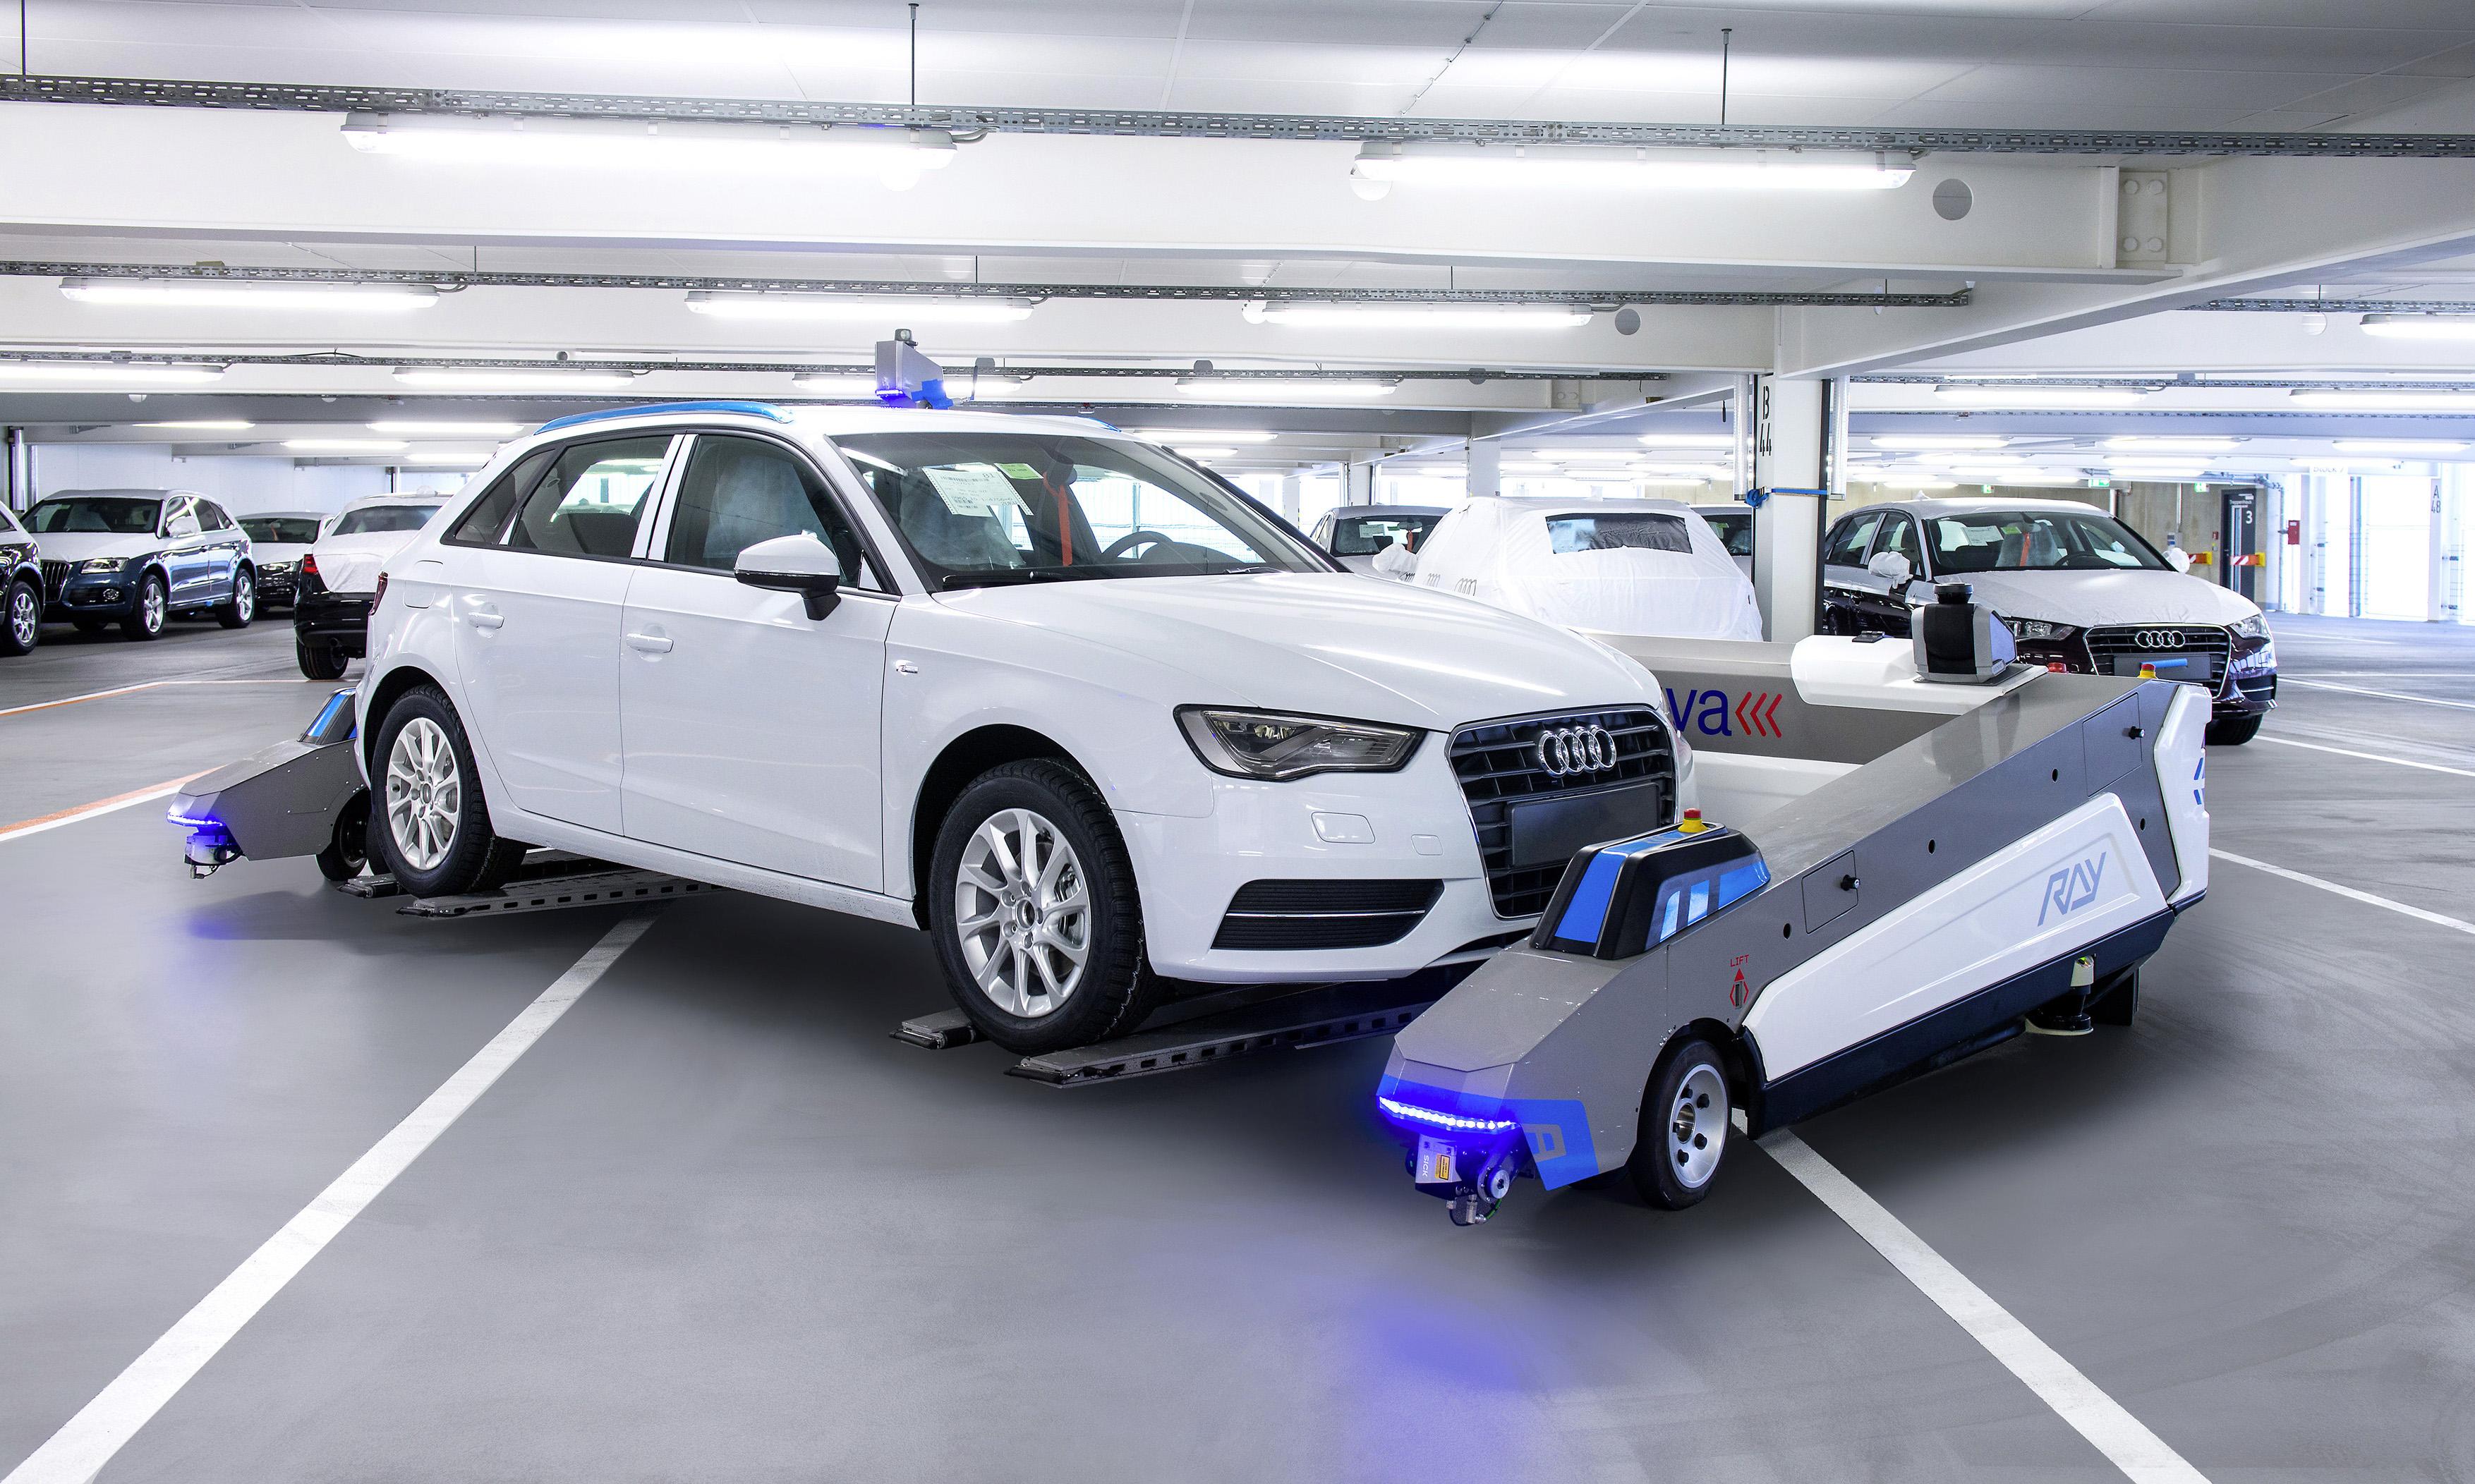 Audi Has SelfDriving Parking Robots Working As Valets Autoevolution - Audi self parking